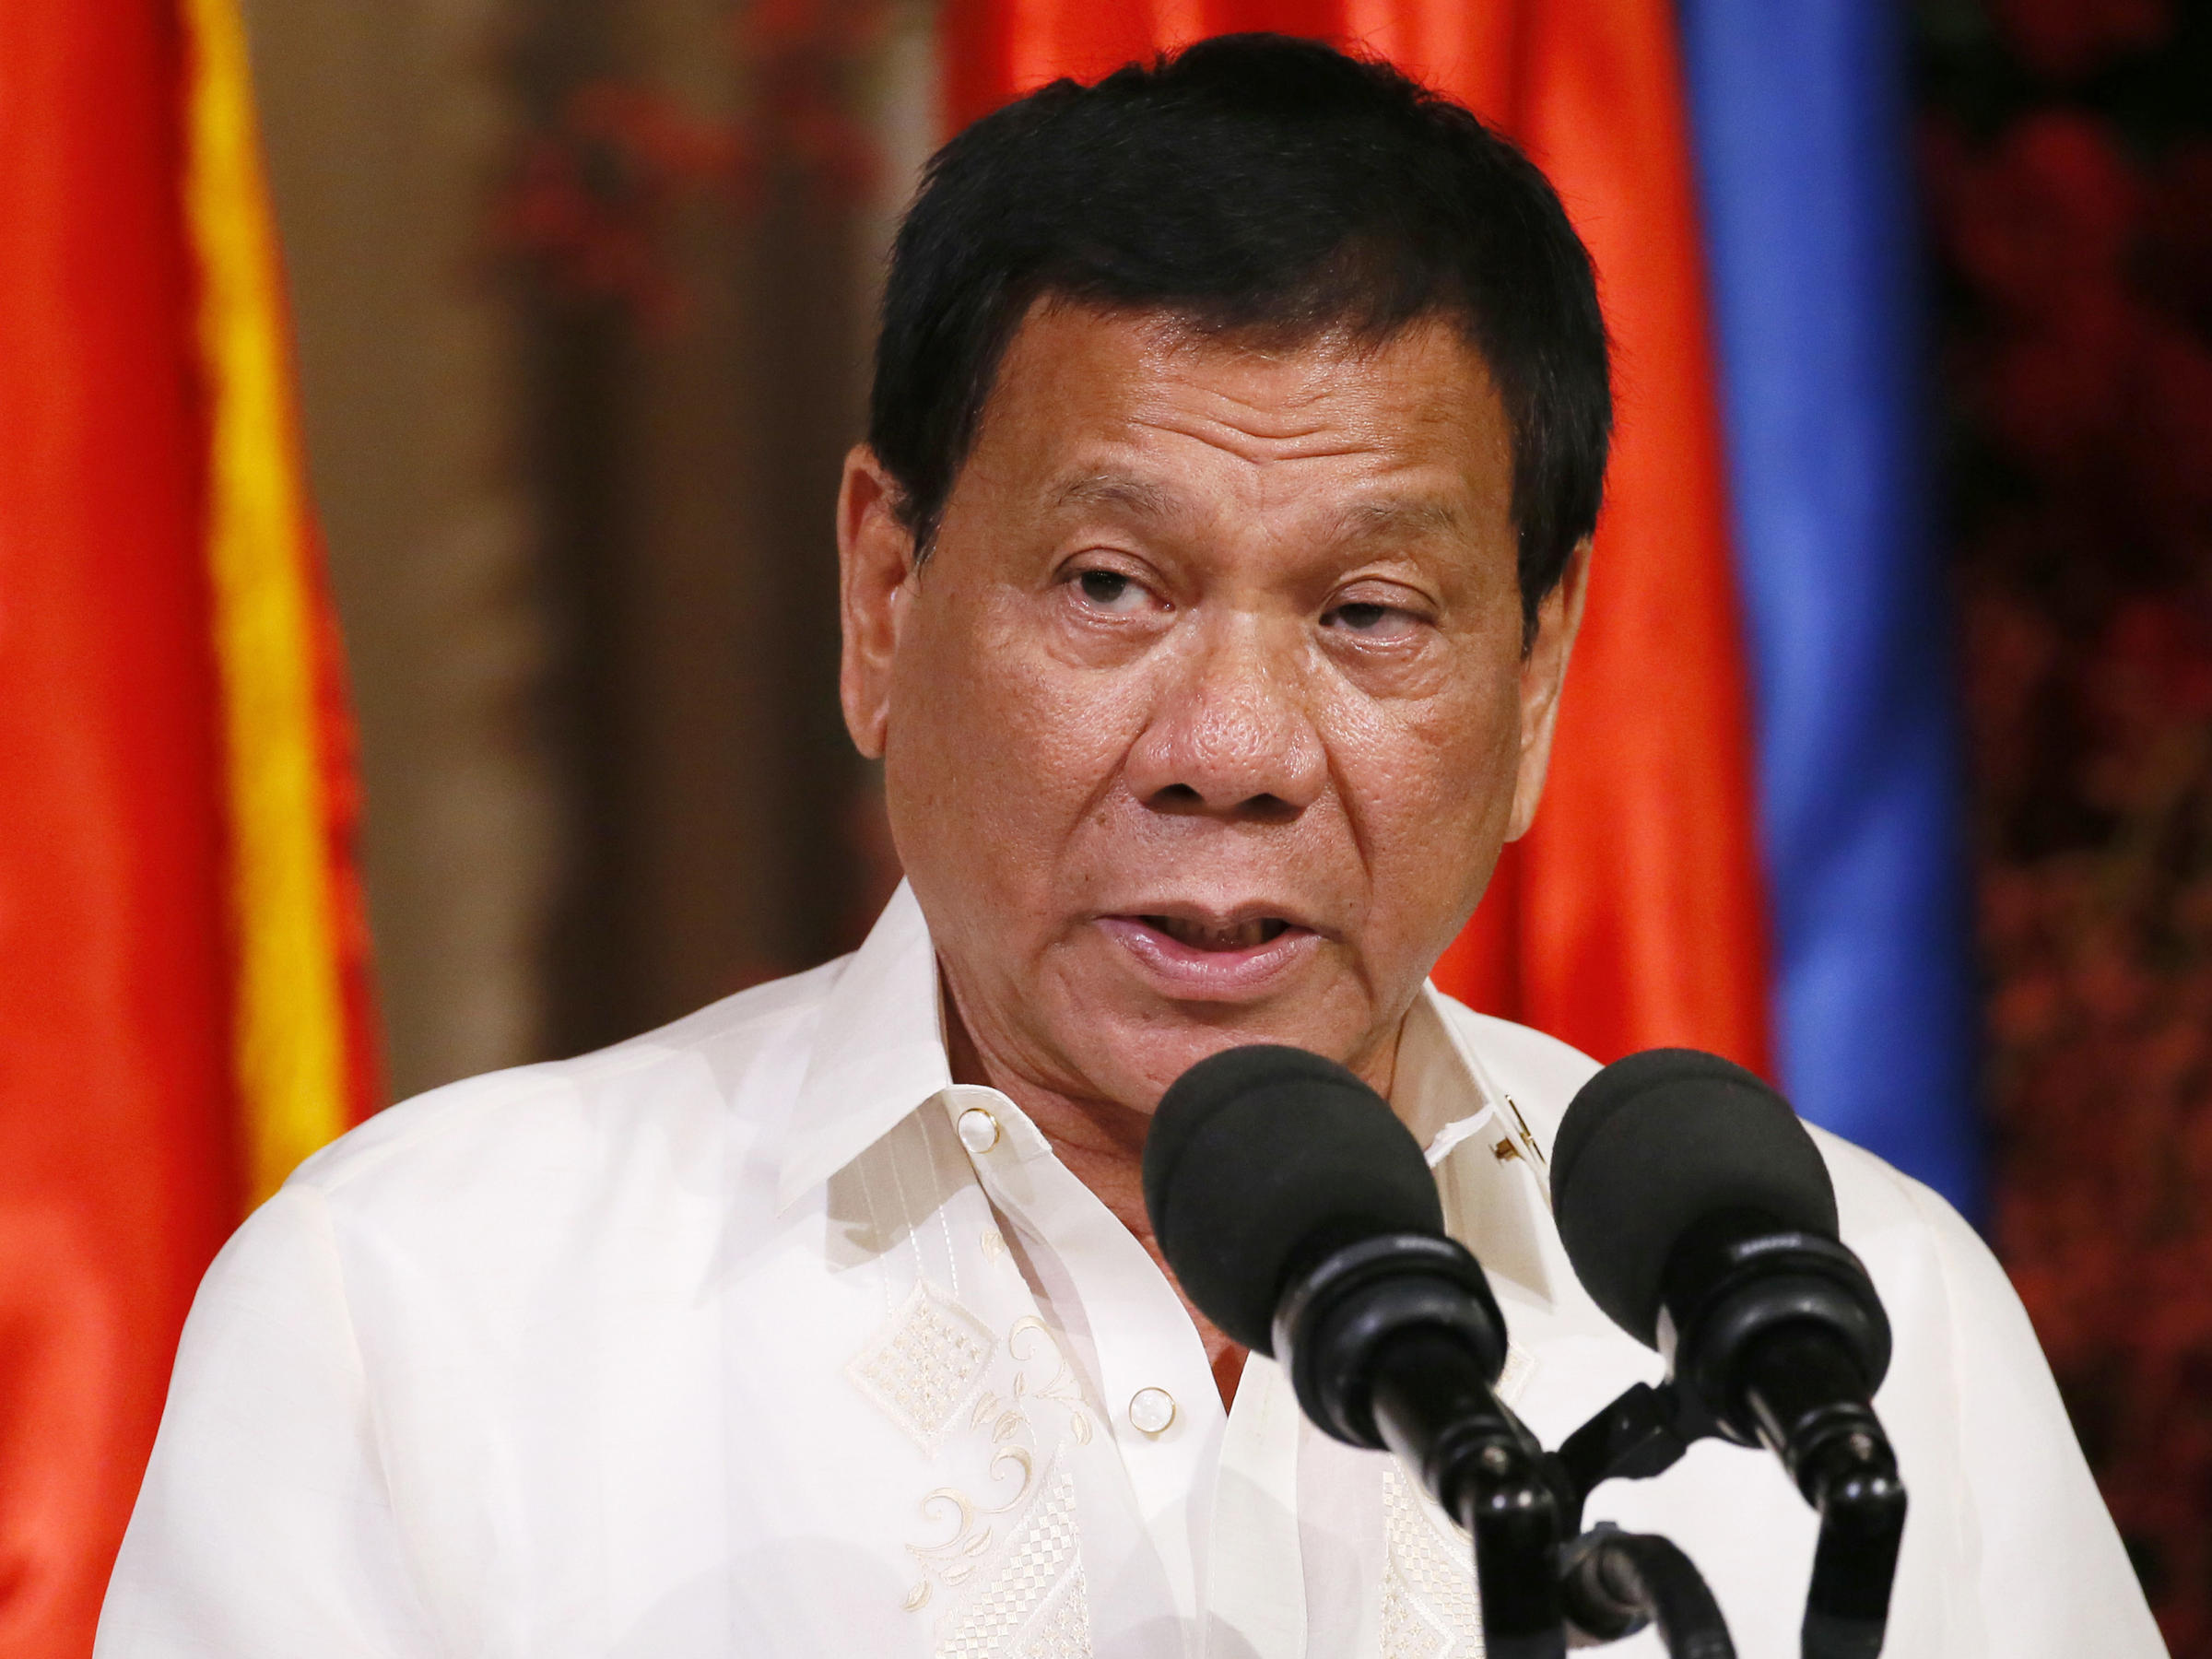 Trump Invites Philippines' Duterte to Washington for Talks